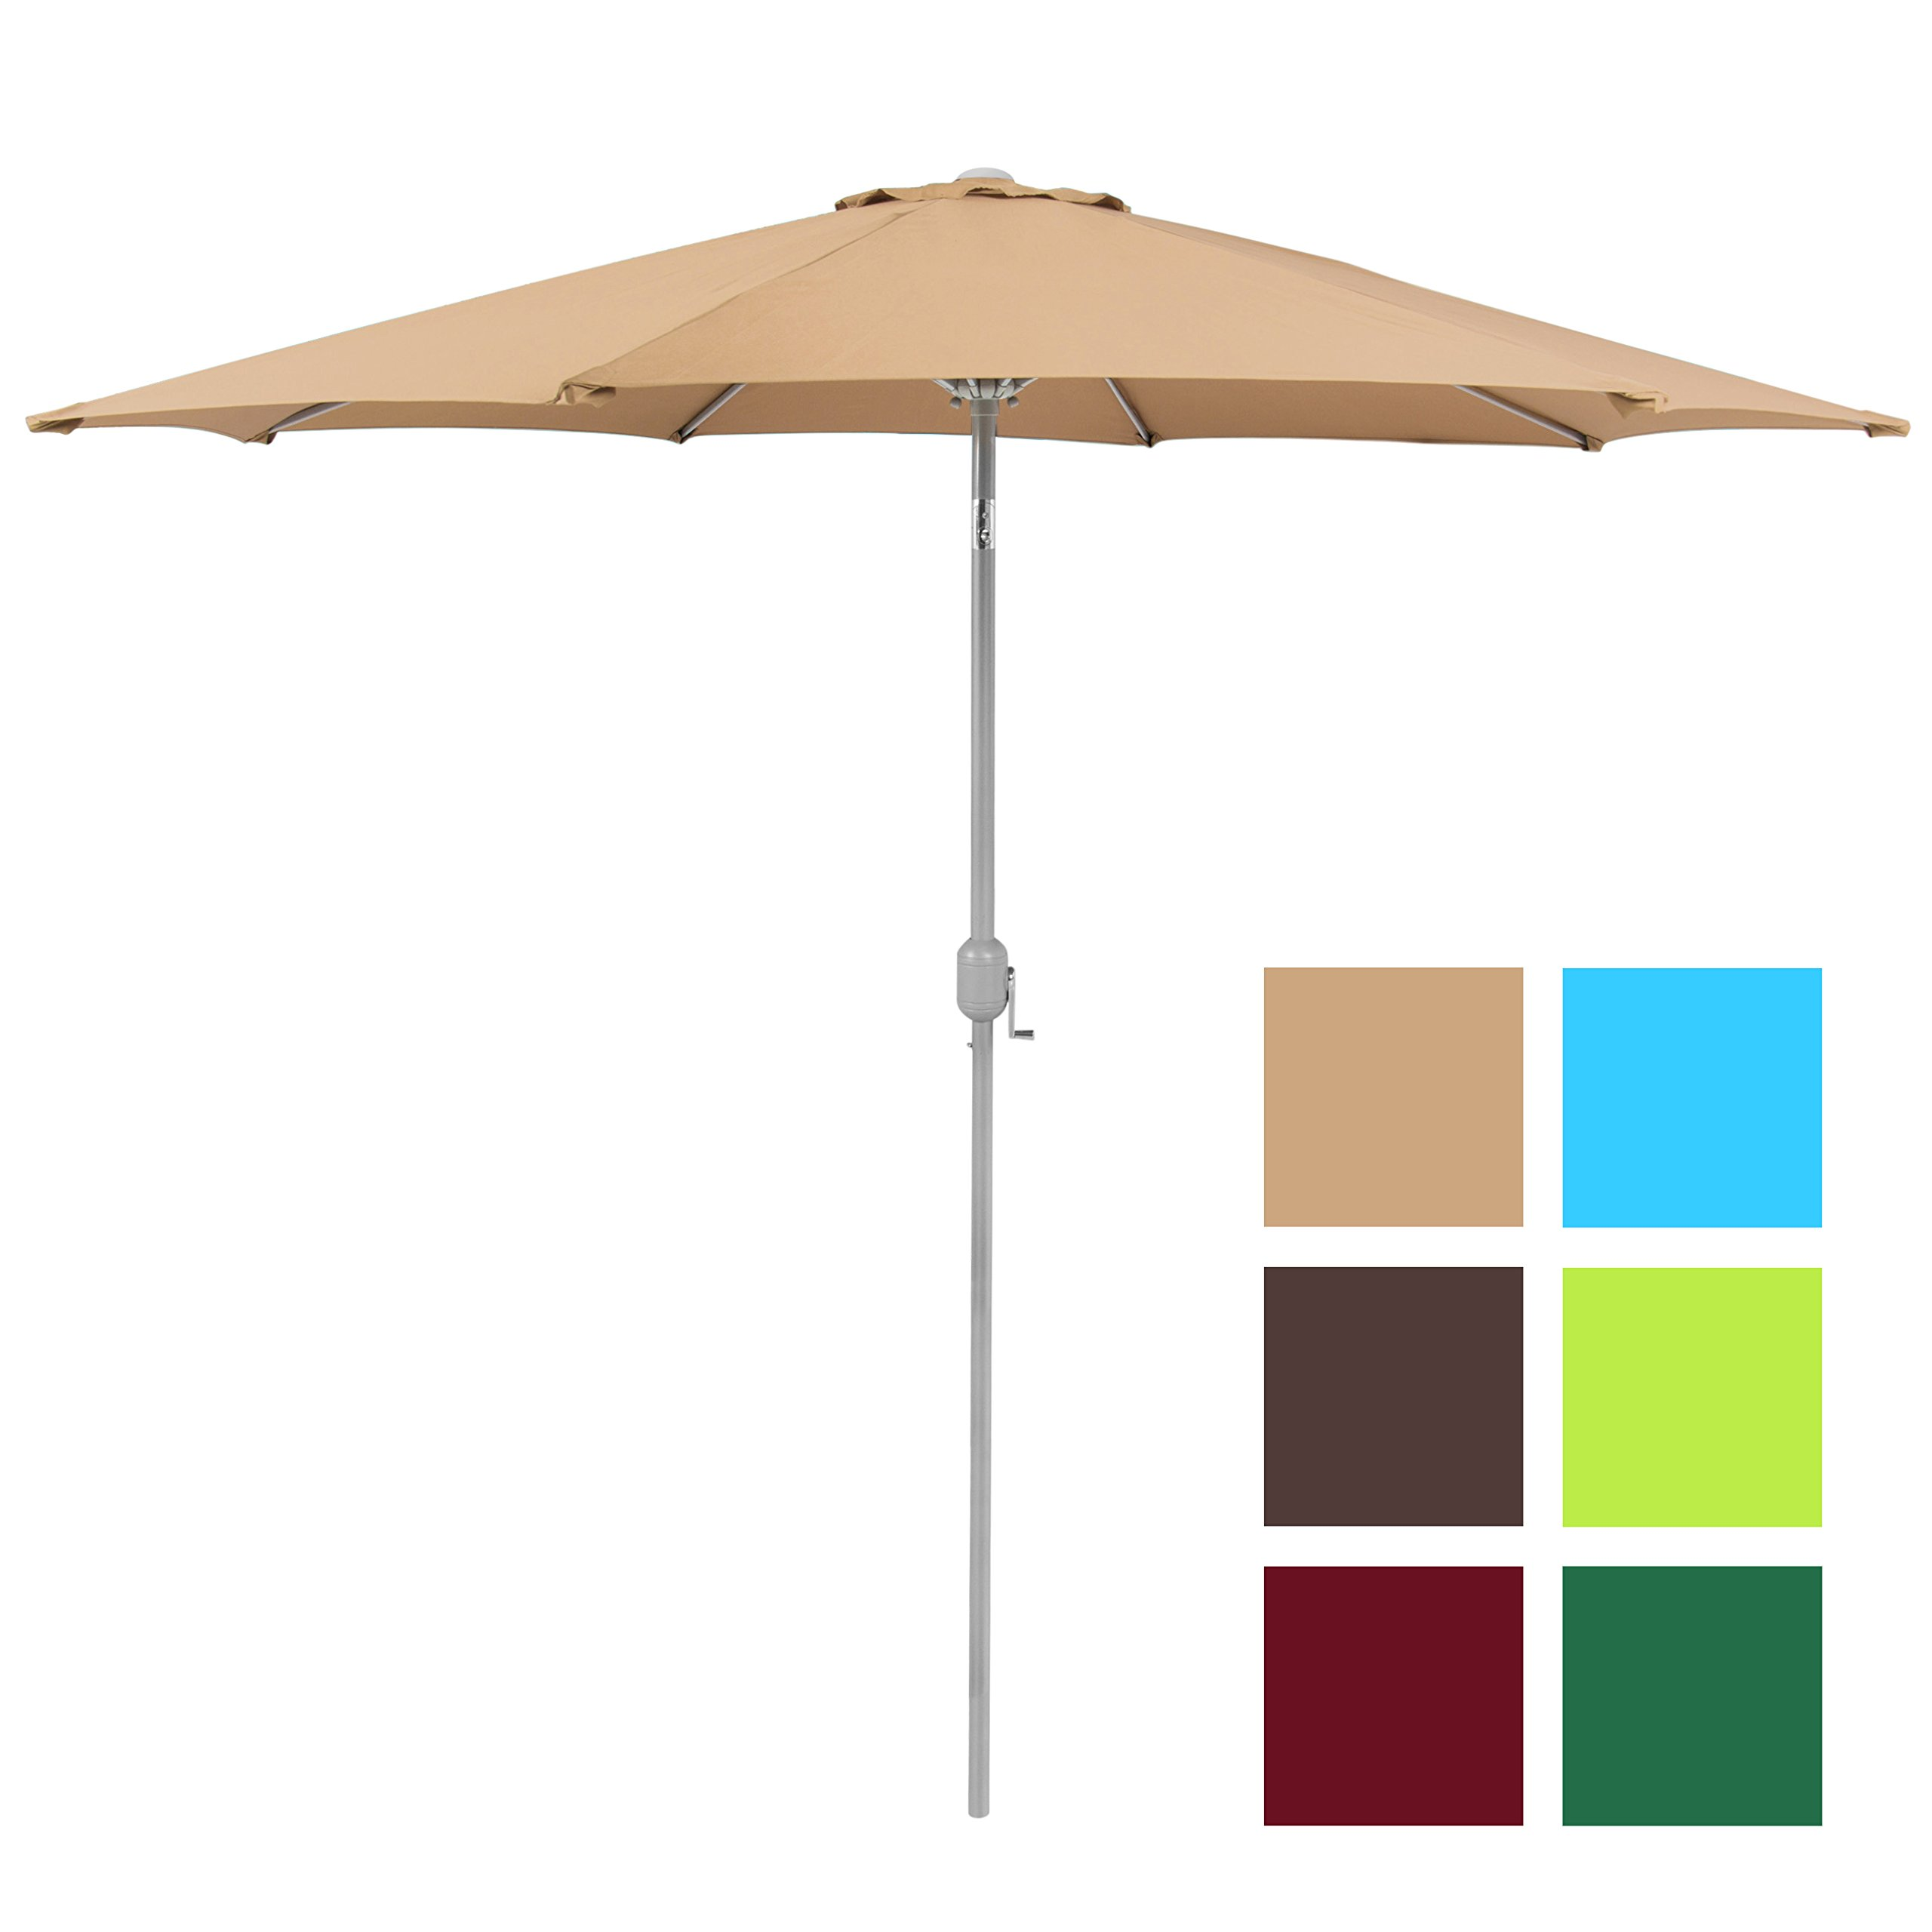 Best Choice Products Patio Umbrella 9ft Aluminum Outdoor Patio Market Umbrella w/Crank Tilt - Beige